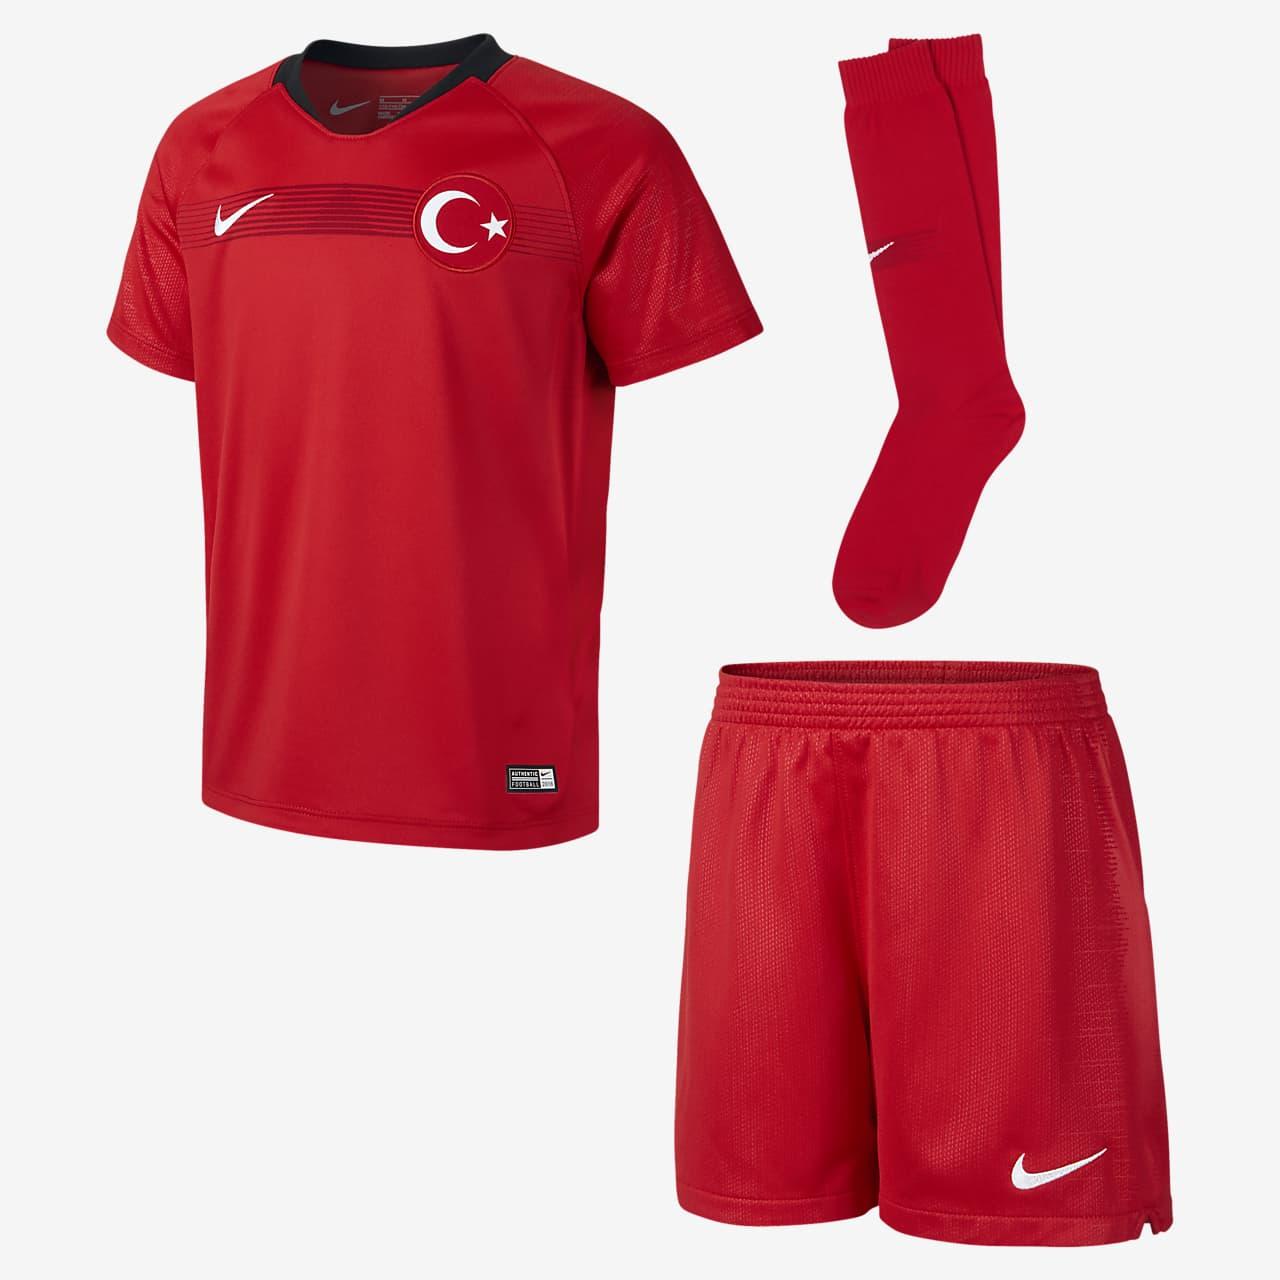 2018 Turkey Stadium Home Voetbaltenue voor kleuters